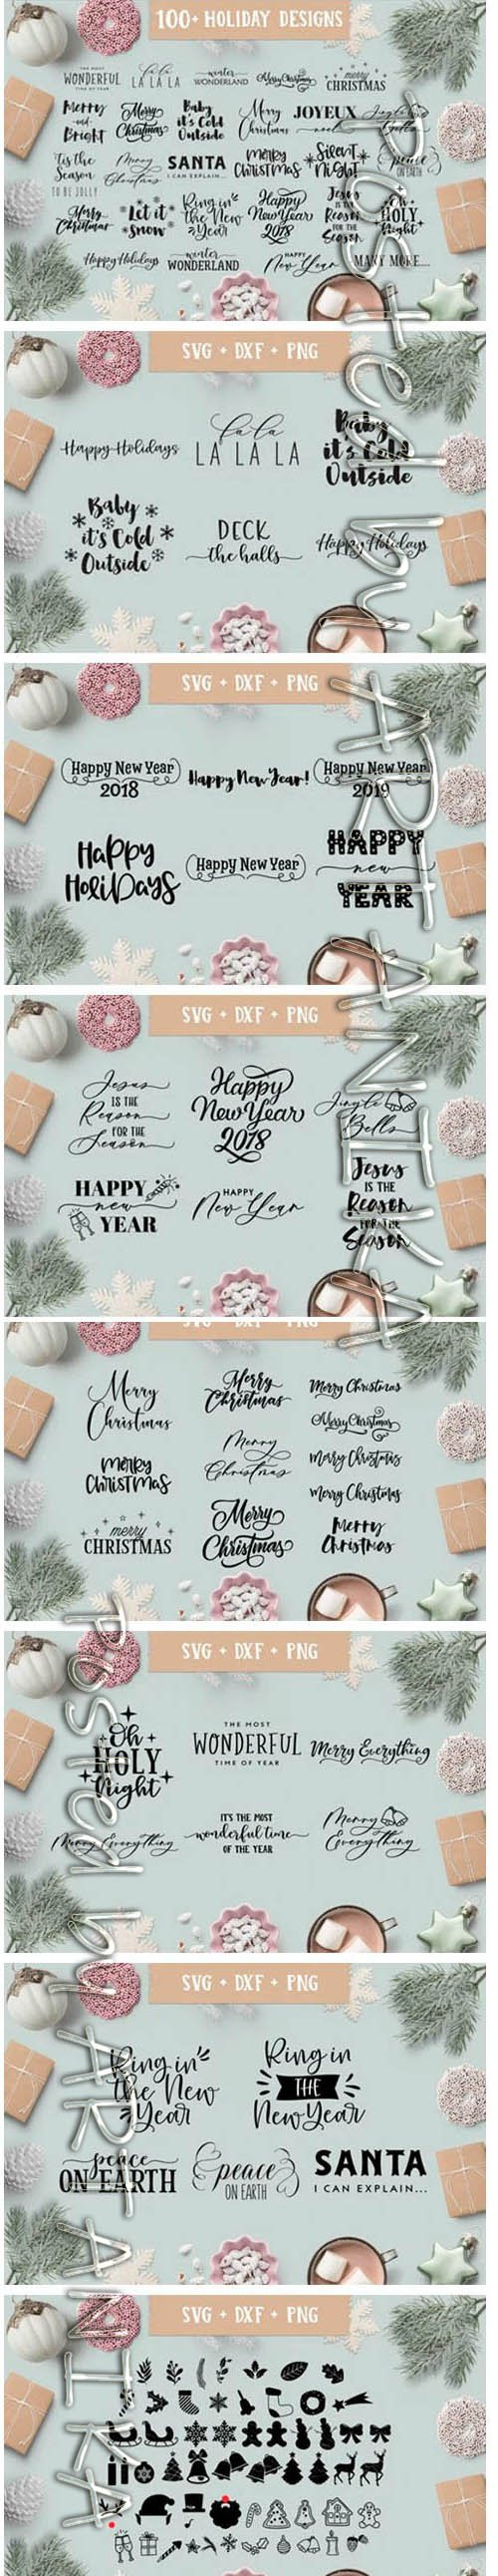 Christmas/Holiday Quotes SVG Bundle 2012477